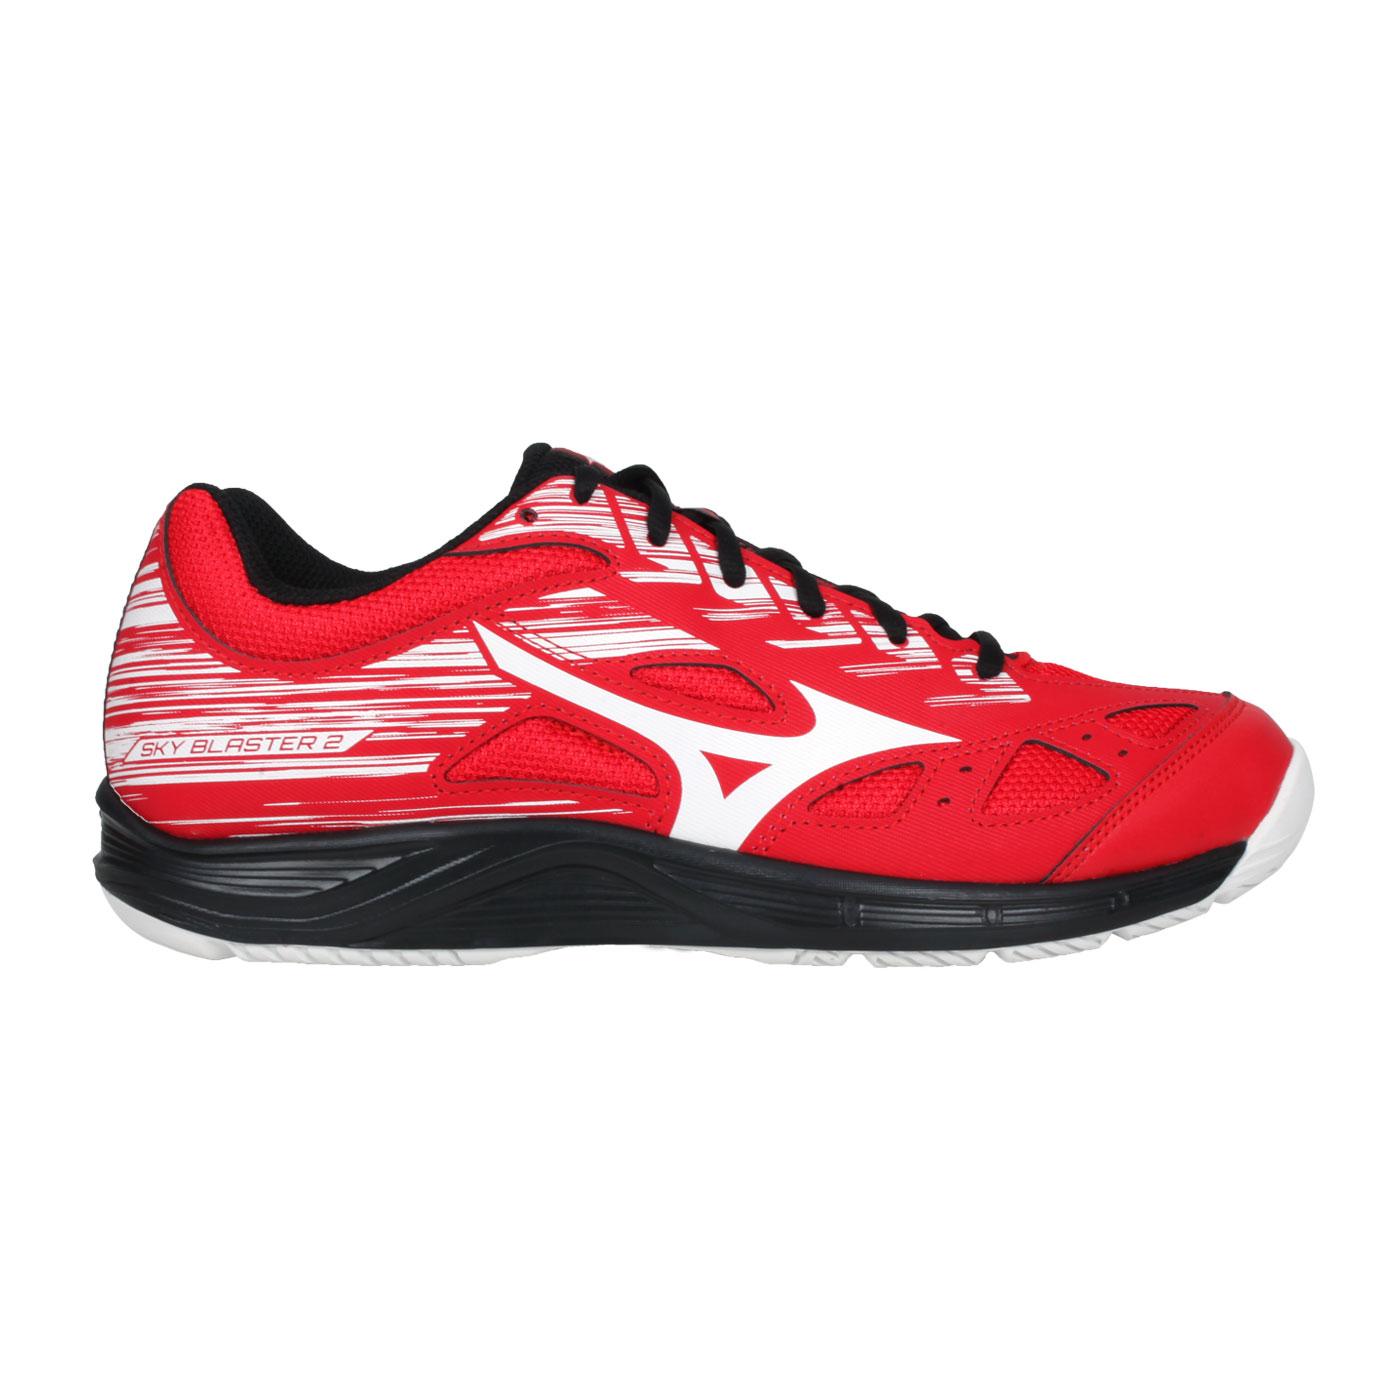 MIZUNO 男款羽球鞋   @SKY BLASTER 2@71GA204563 - 紅白